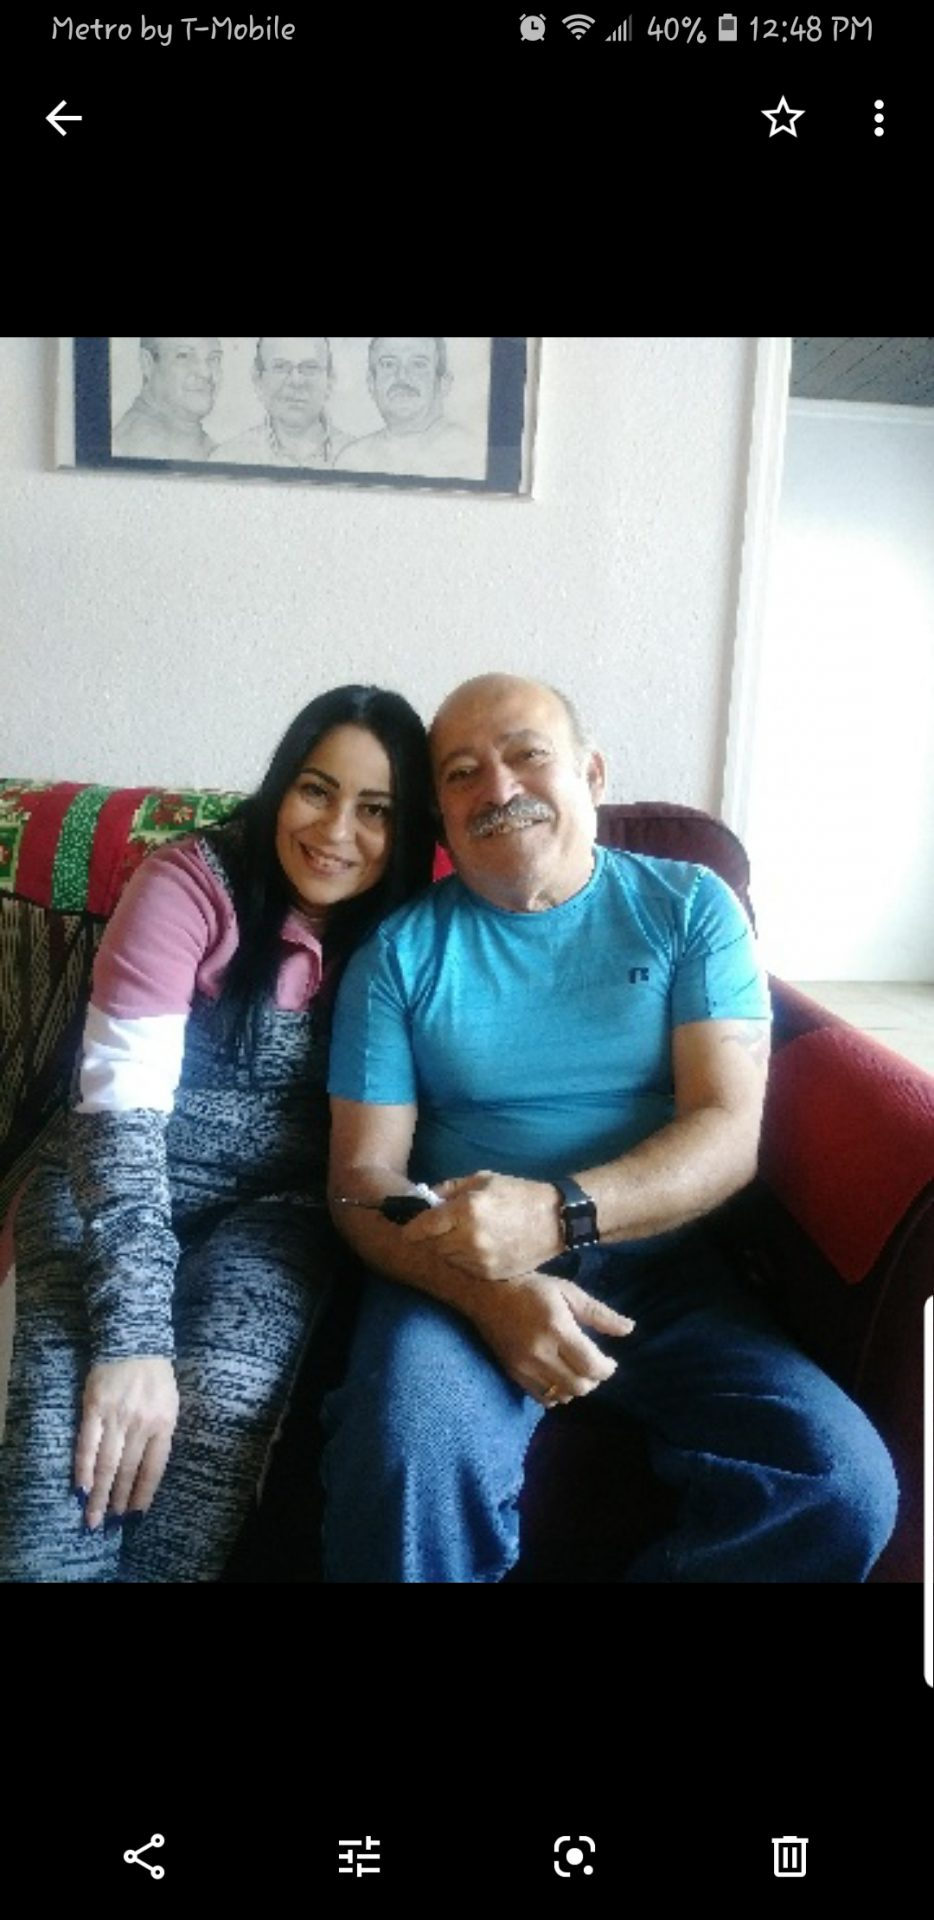 R.I.P Dad! I will always miss u!